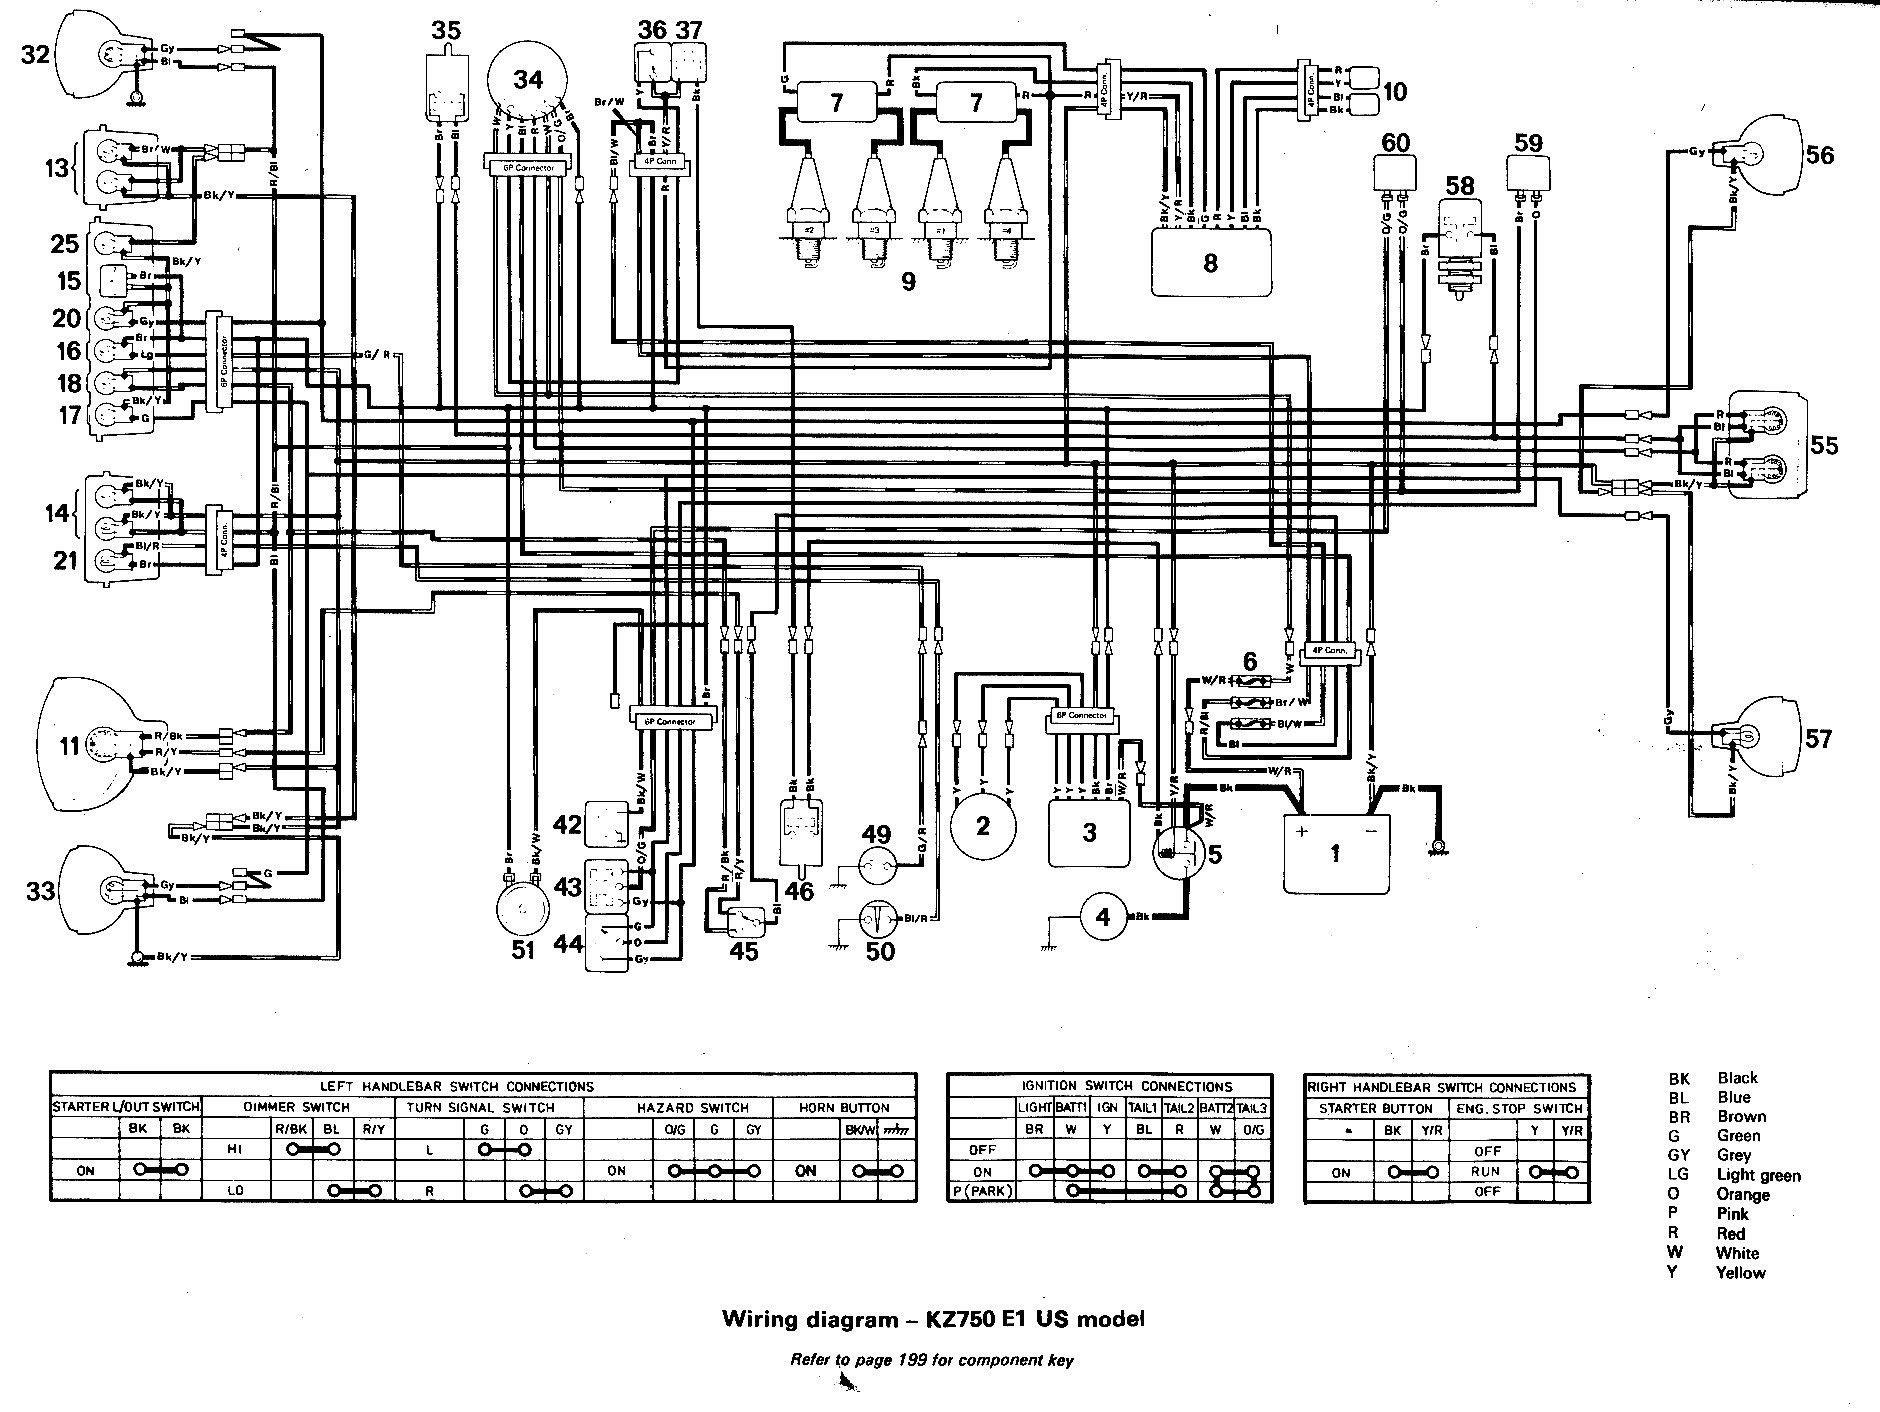 Awesome Wiring Diagram Xj 600  Diagrams  Digramssample